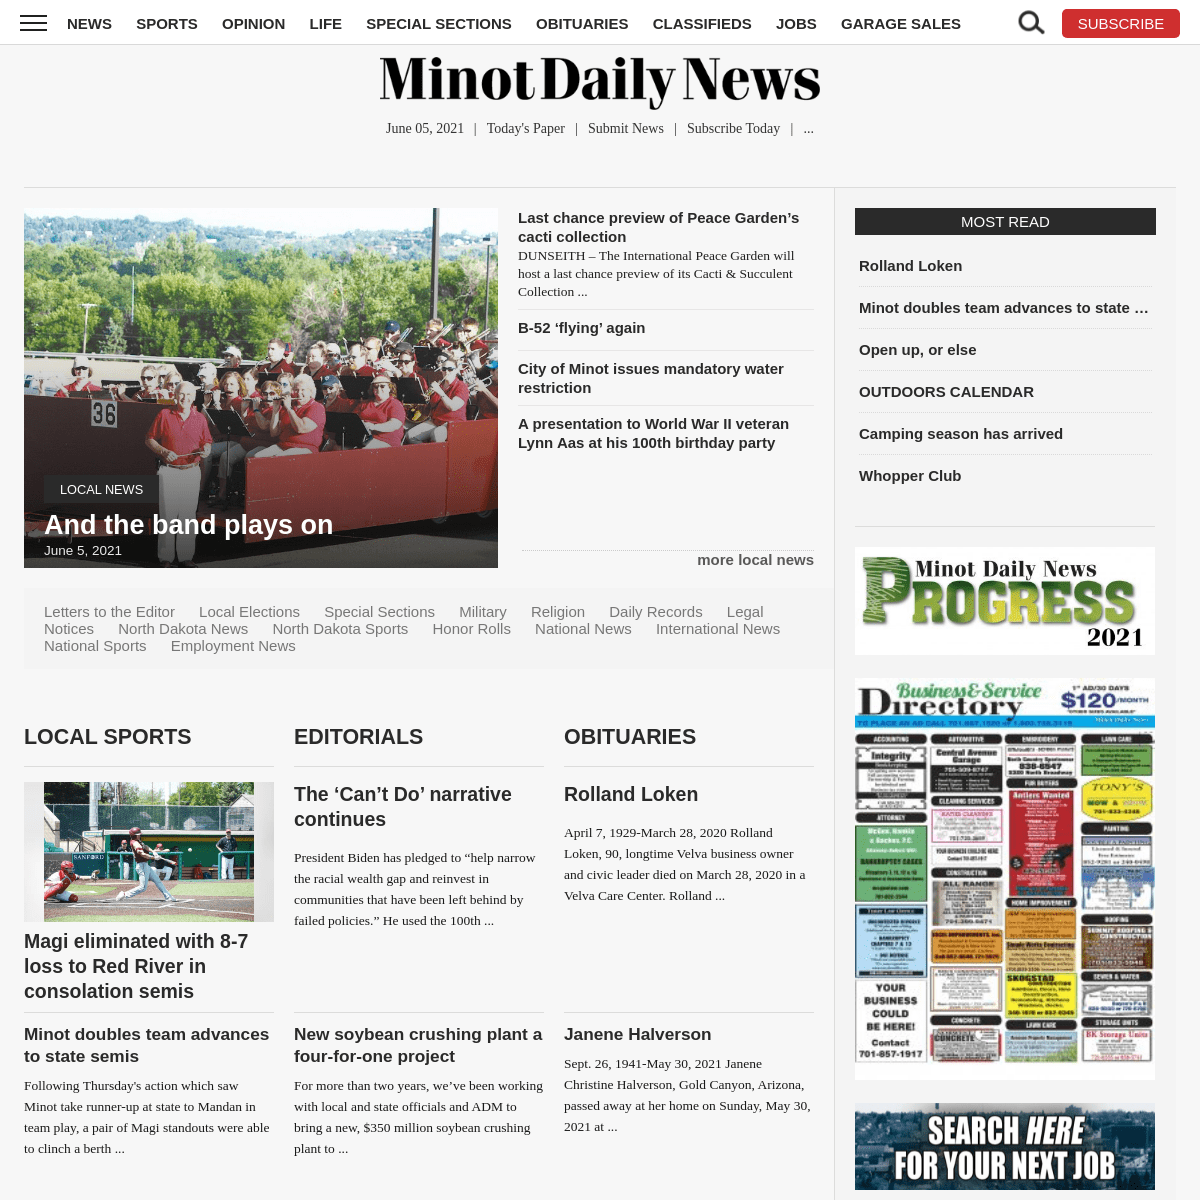 News, Sports, Jobs - Minot Daily News